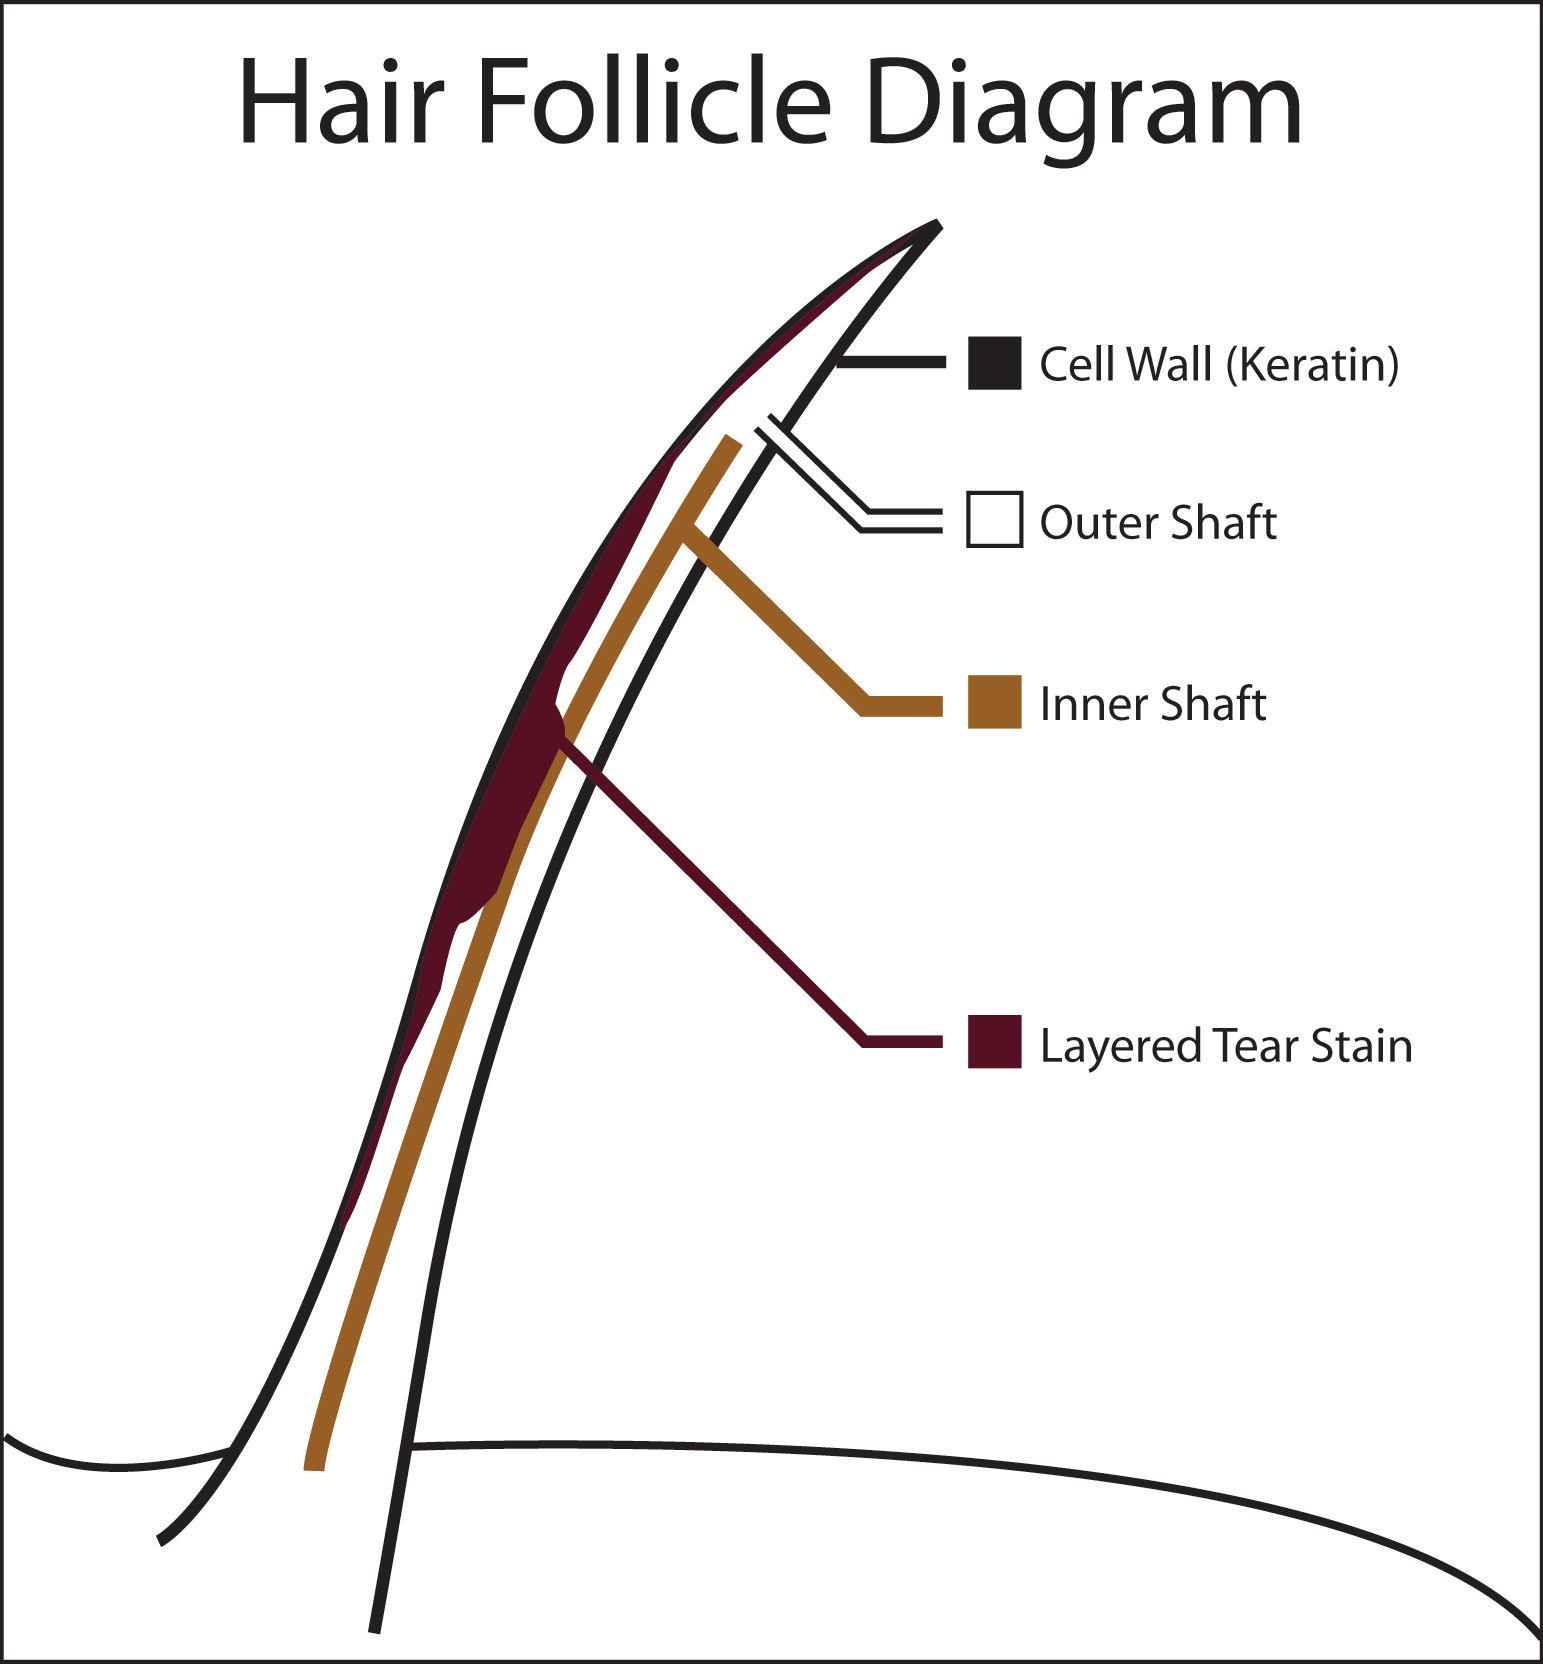 Hair Follicle Diagram For Pinterest